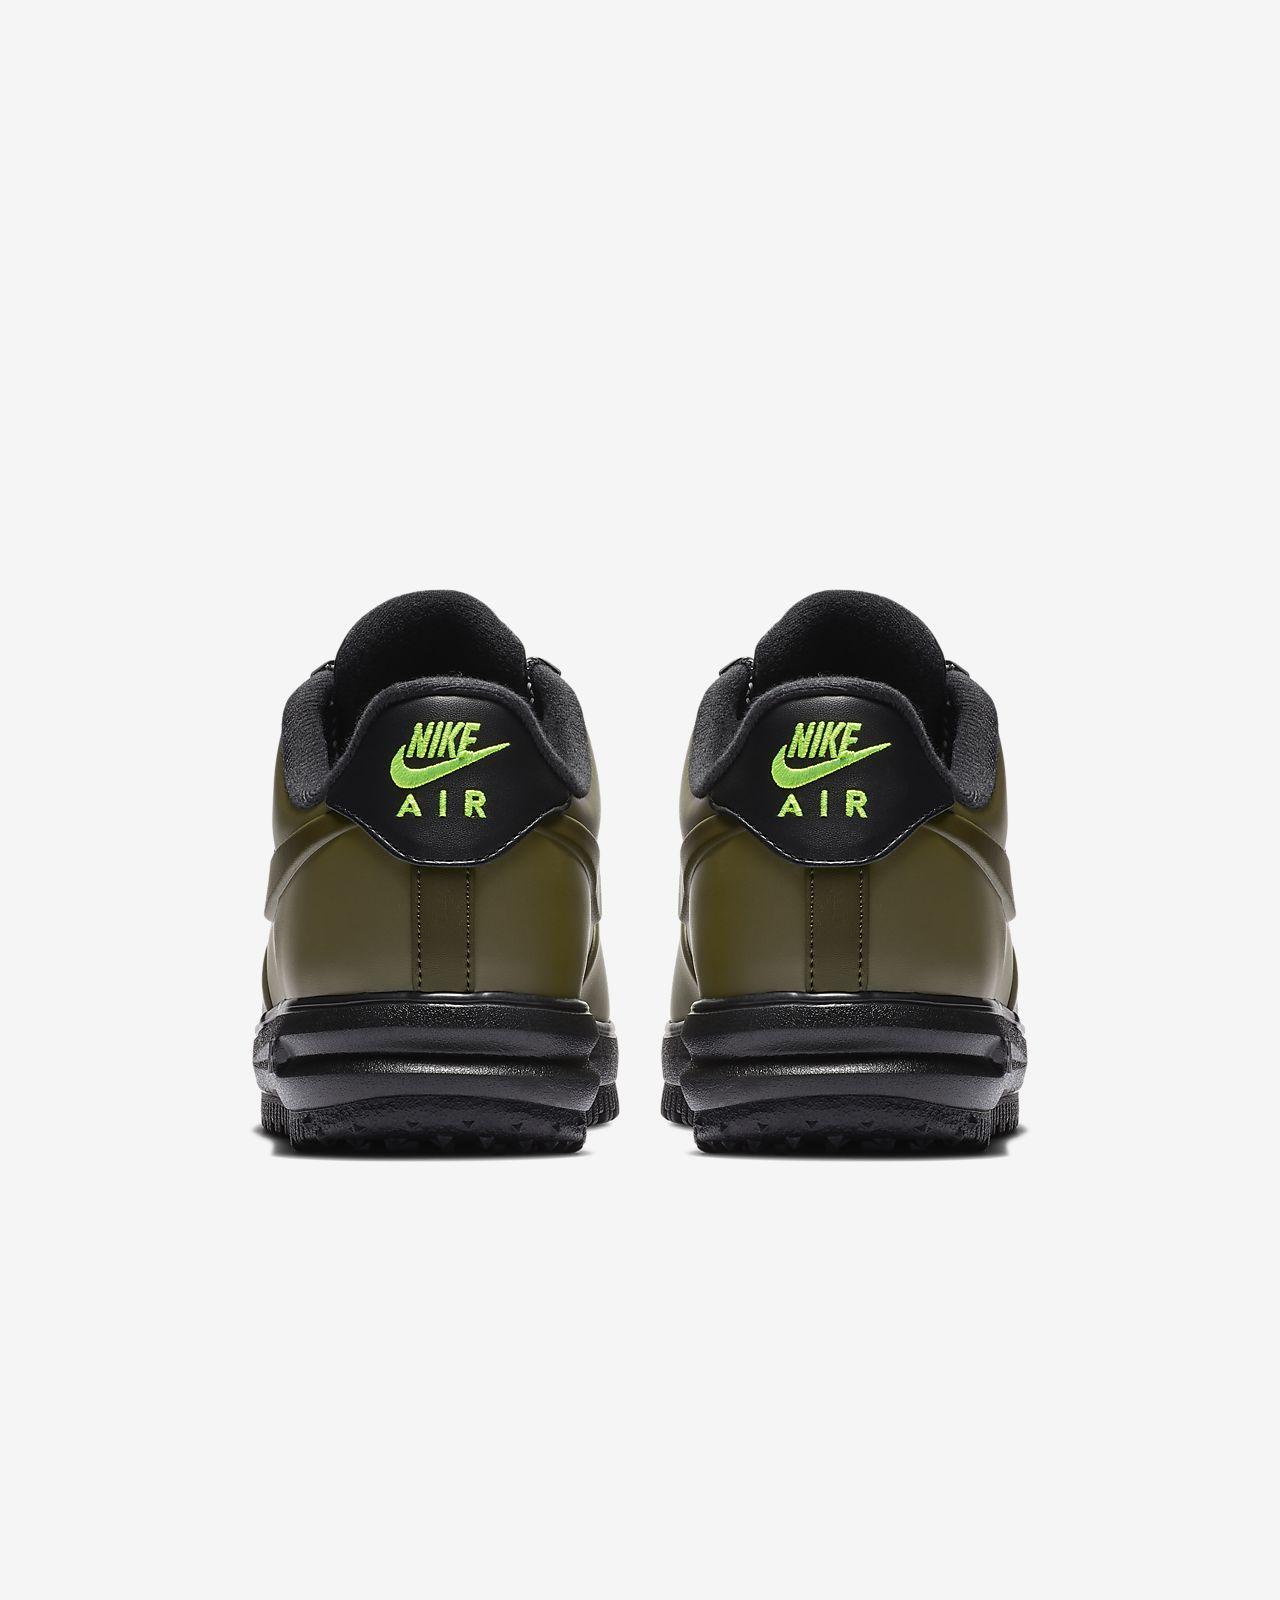 big sale 93577 ab934 ... Sko Nike Lunar Force 1 Duckboot Low för män